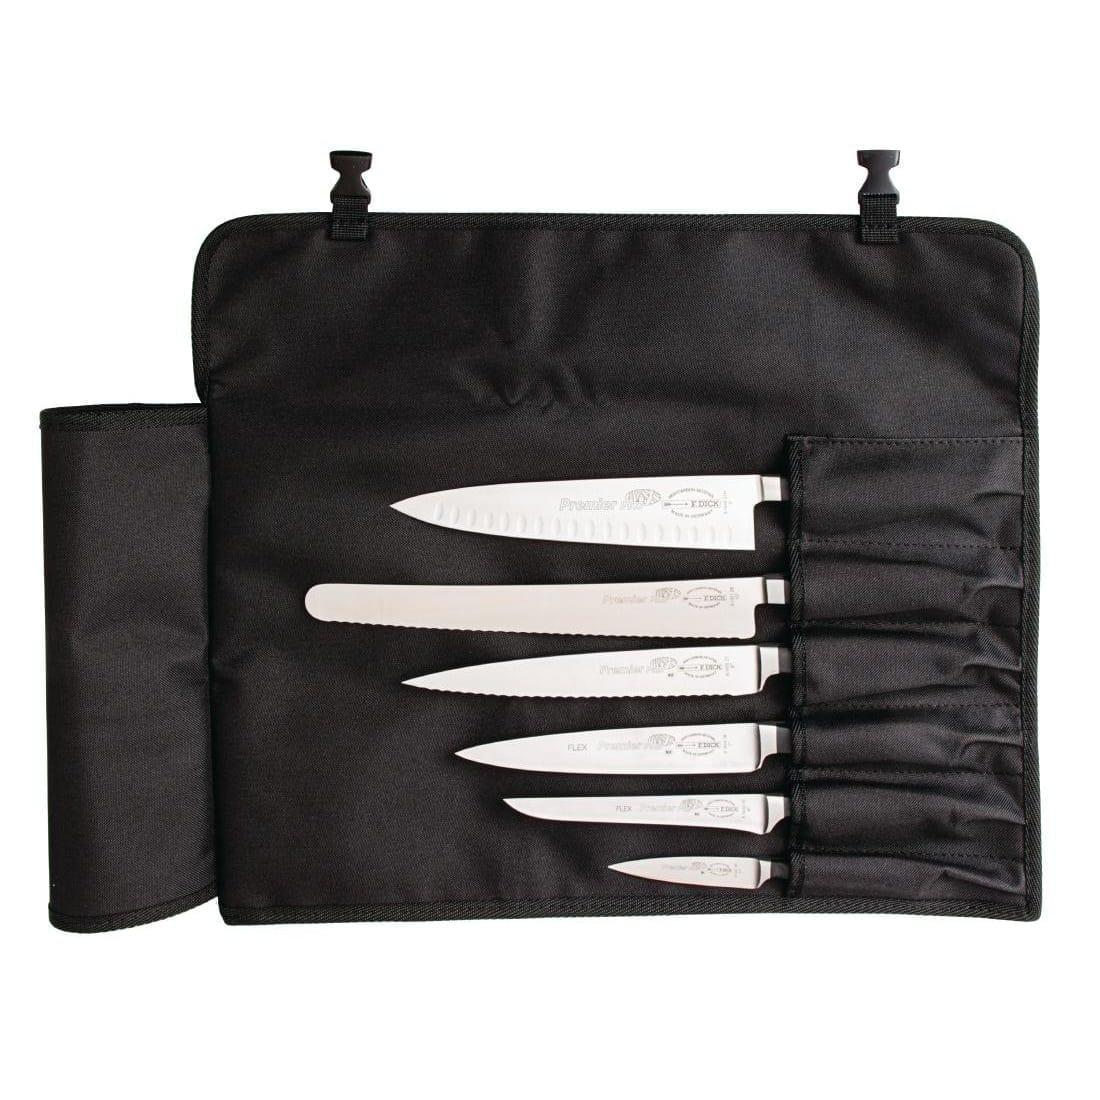 Dick Textile Roll Bag Black - 6 Piece 500(L)x430(W)mm-0